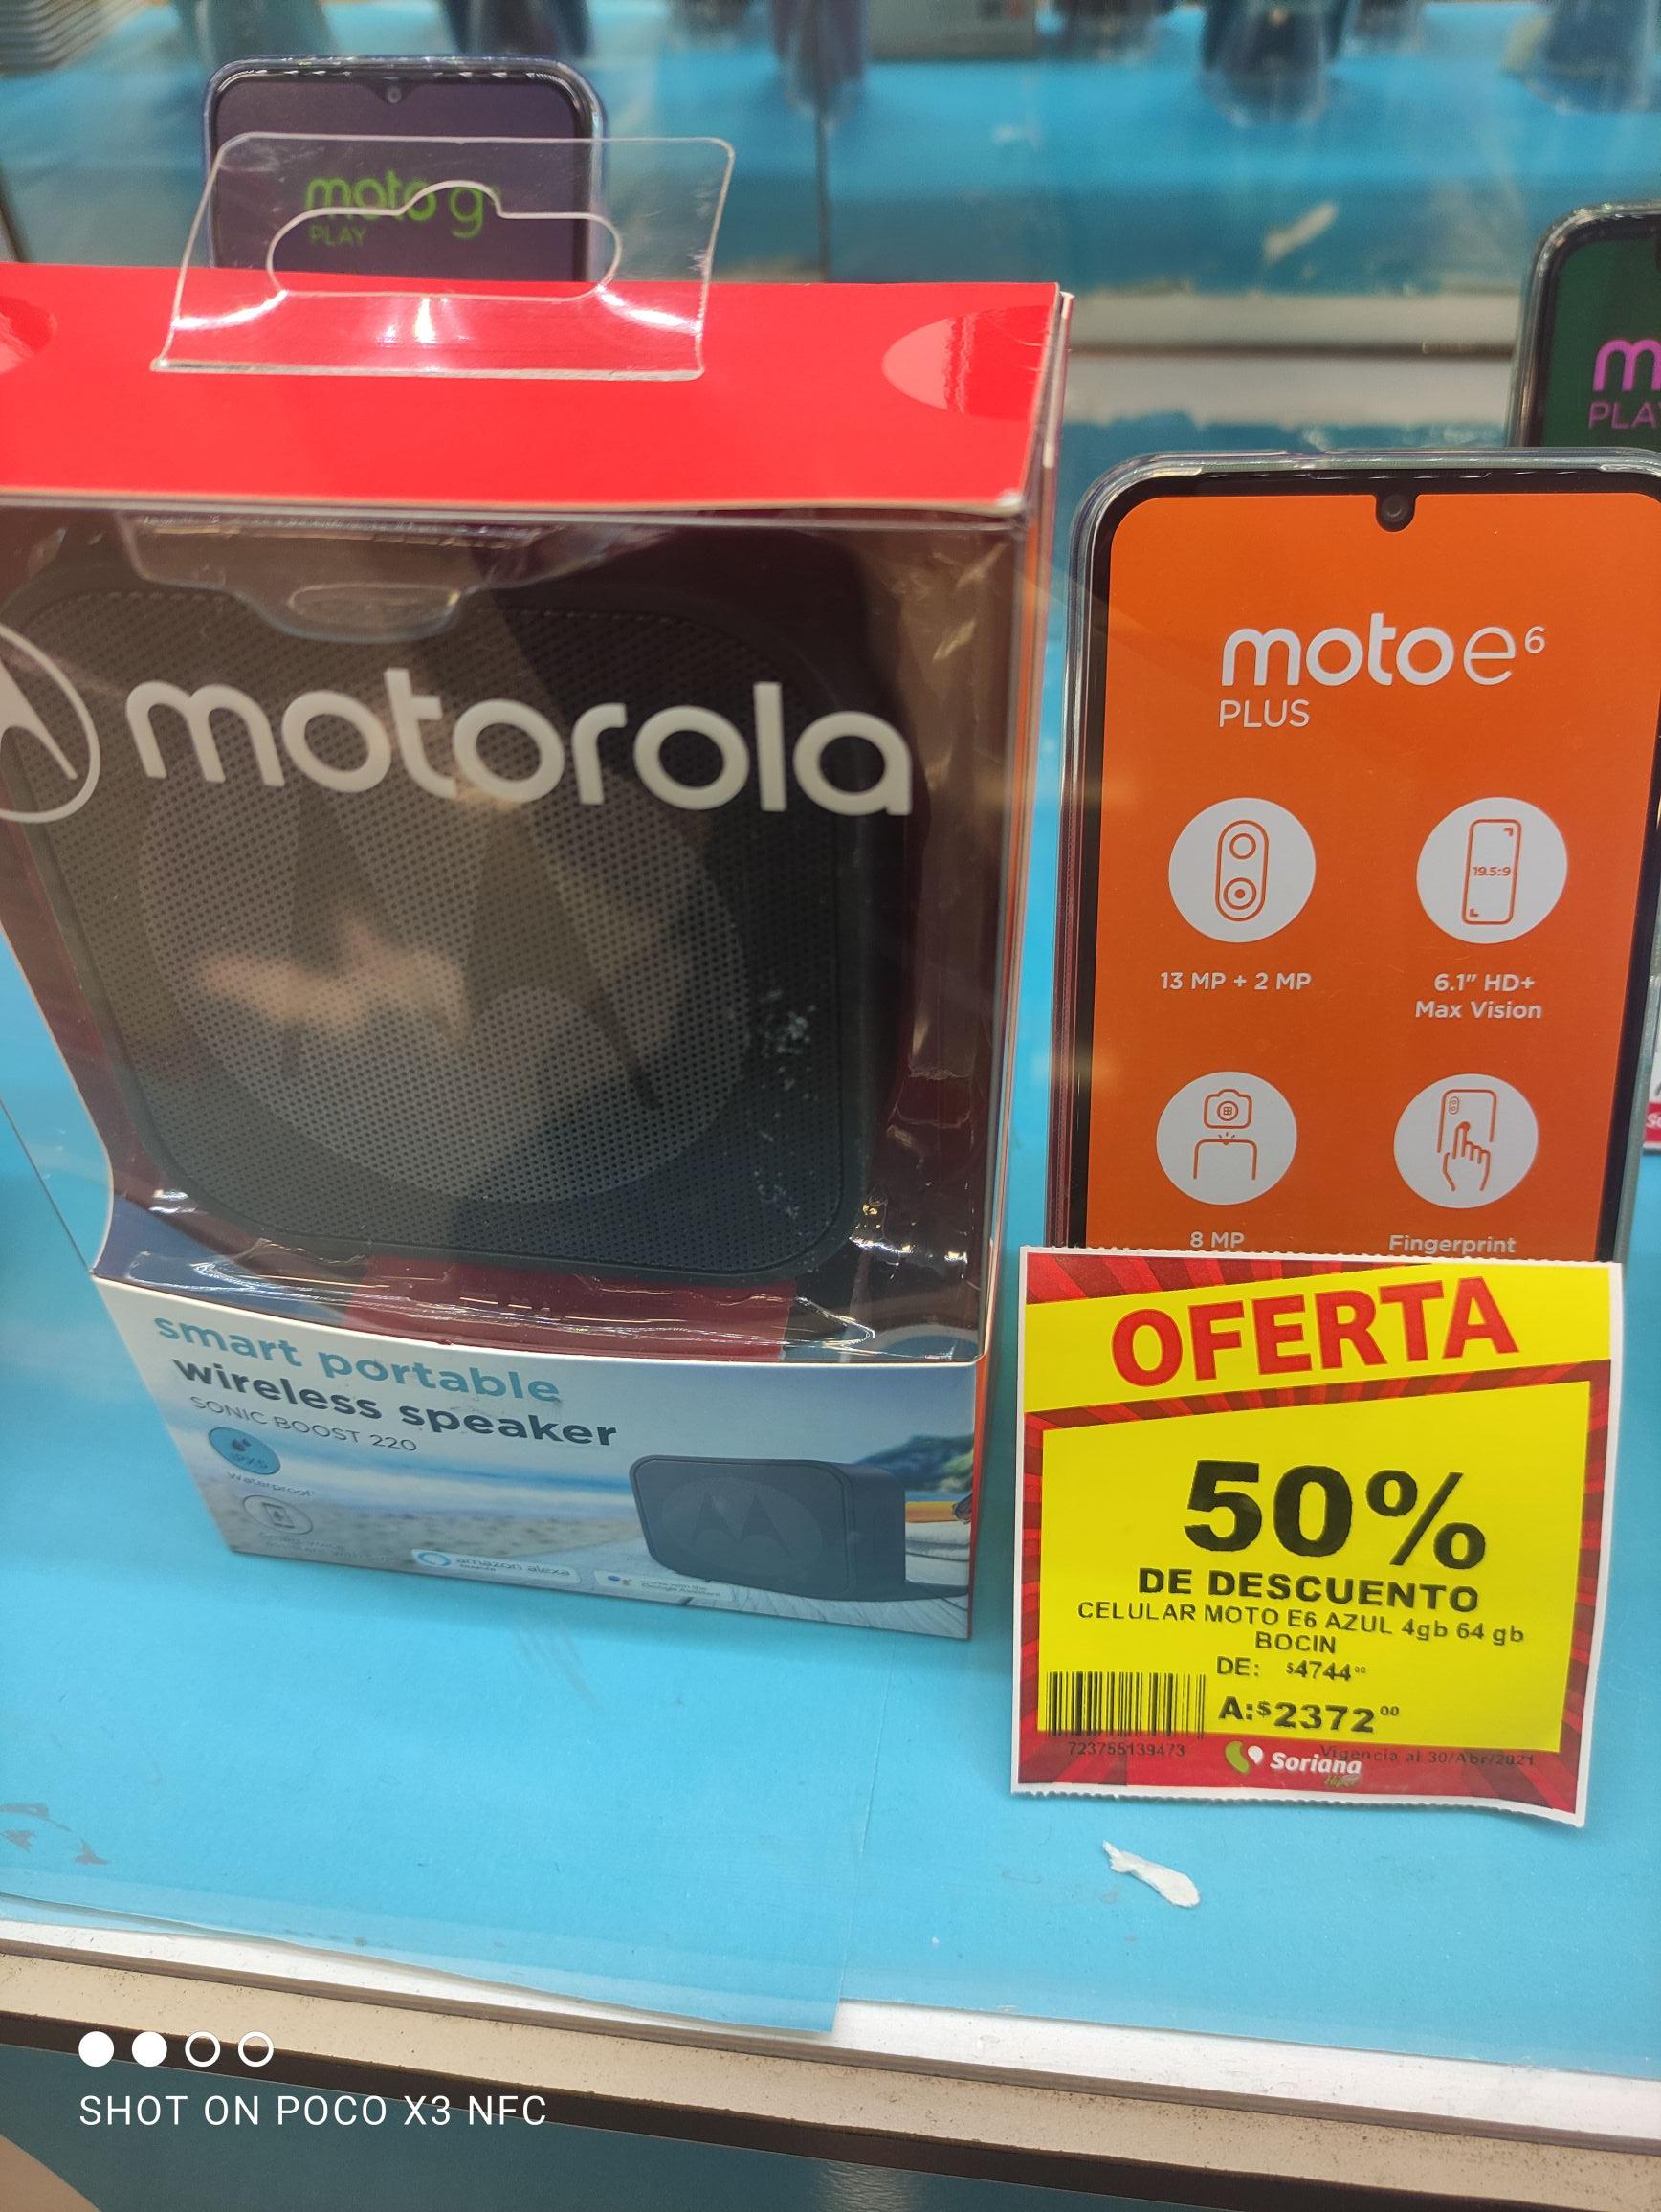 Soriana: Moto e6 plus 4gb ram 64 GB memoria interna + bocina motorola